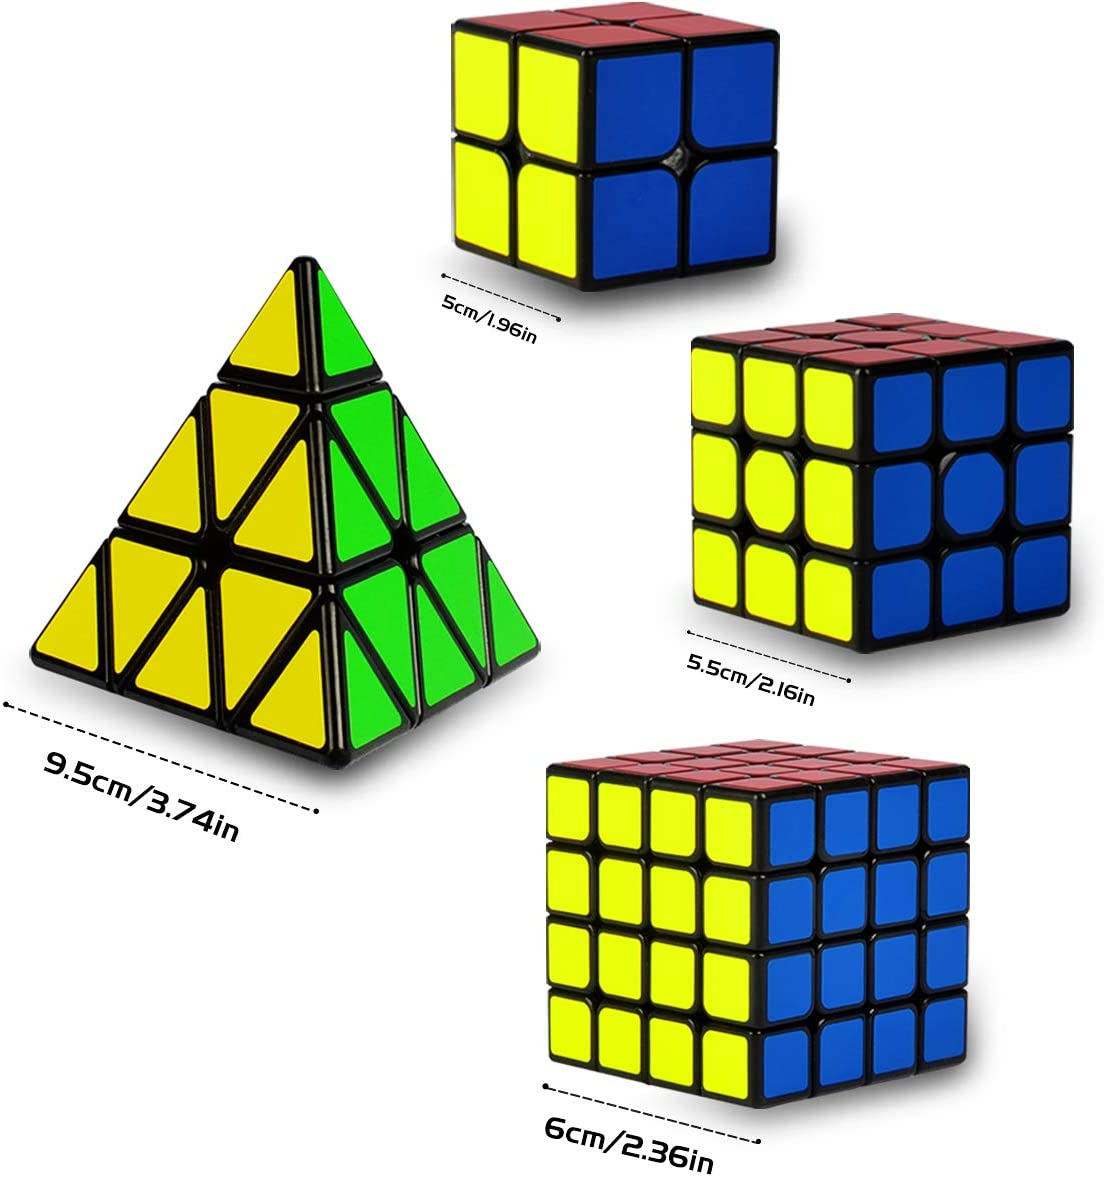 5 St/ück Speed Cube Set 2x2 3x3 Pyraminx Megaminx Mirror SpeedCube Coolzon Zauberw/ürfel Set 3D Puzzle Magic Cubes f/ür Kinder Erwachsene Anf/änger